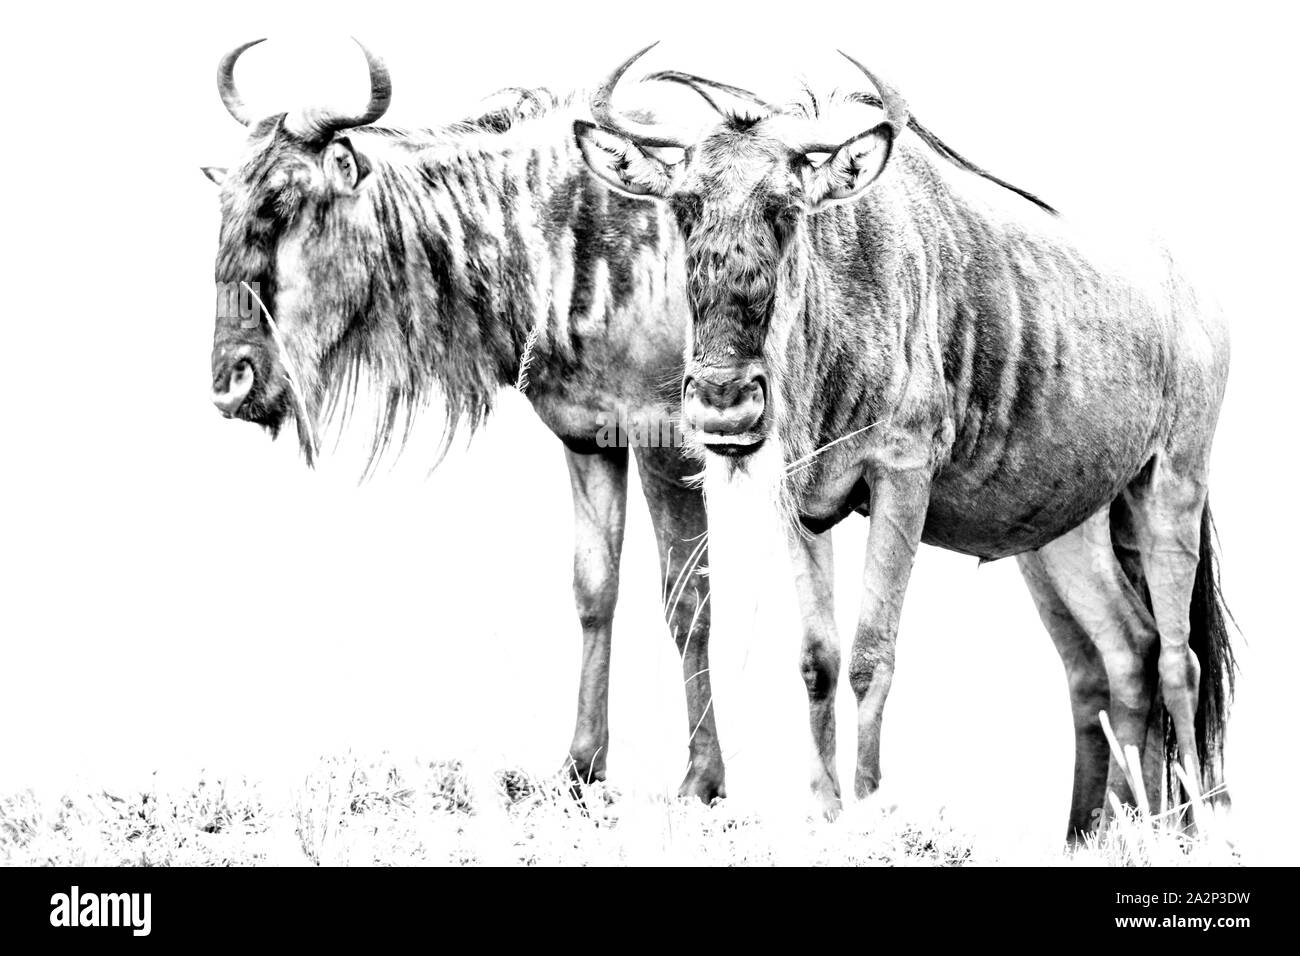 Clave alta Foto de ñus, Masai Mara, Kenya Foto de stock